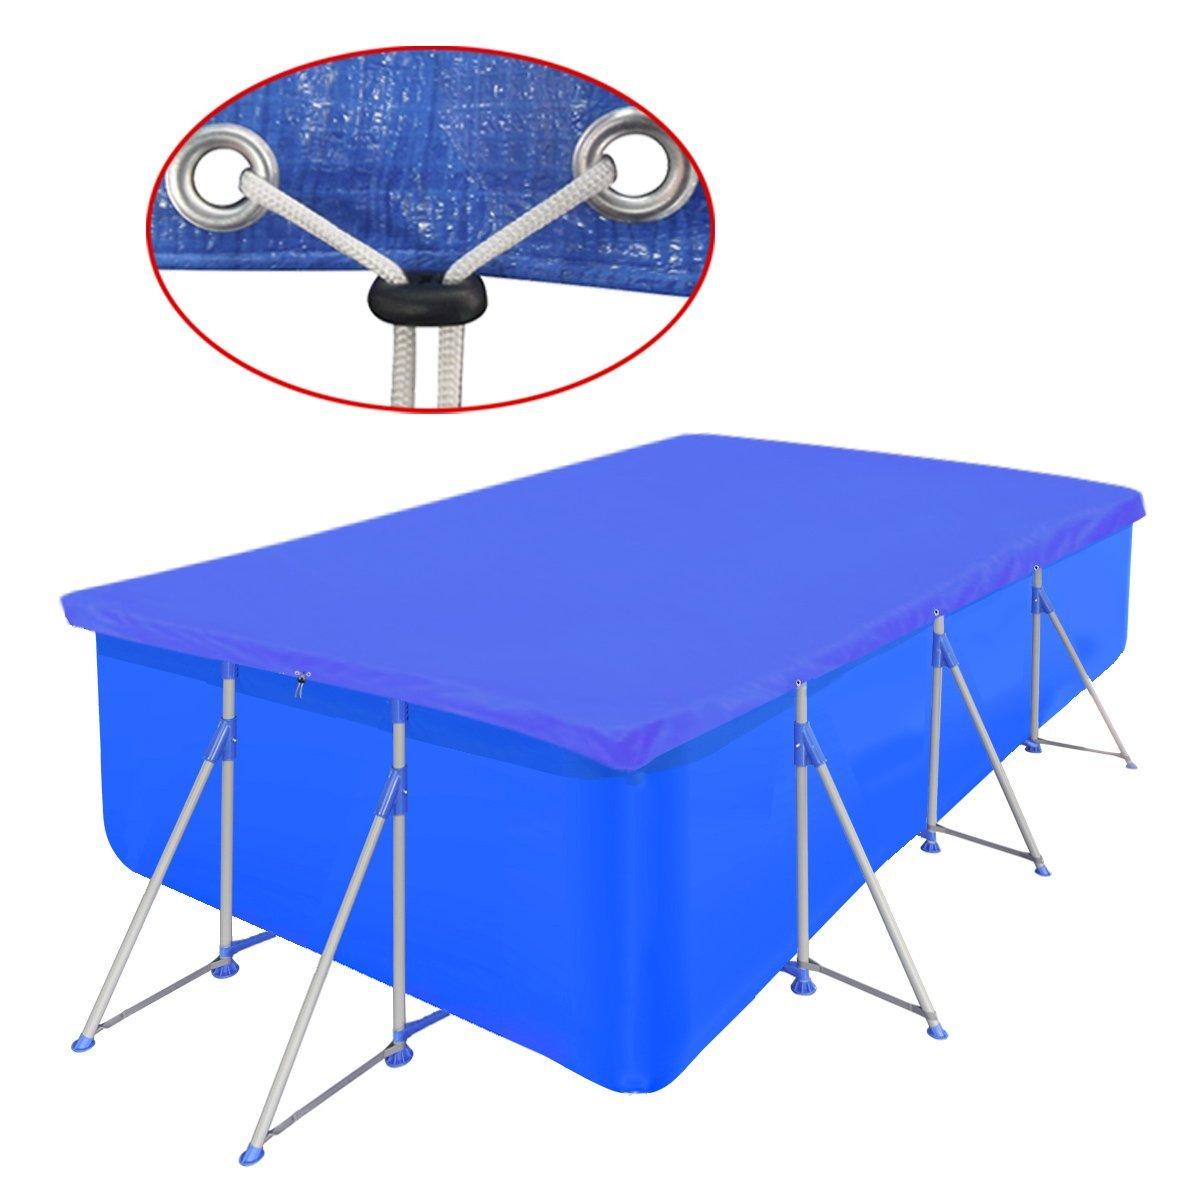 vidaXL Pool Cover PE Rectangular 90 g/sqm 400x207 cm Cloth Safety Protector